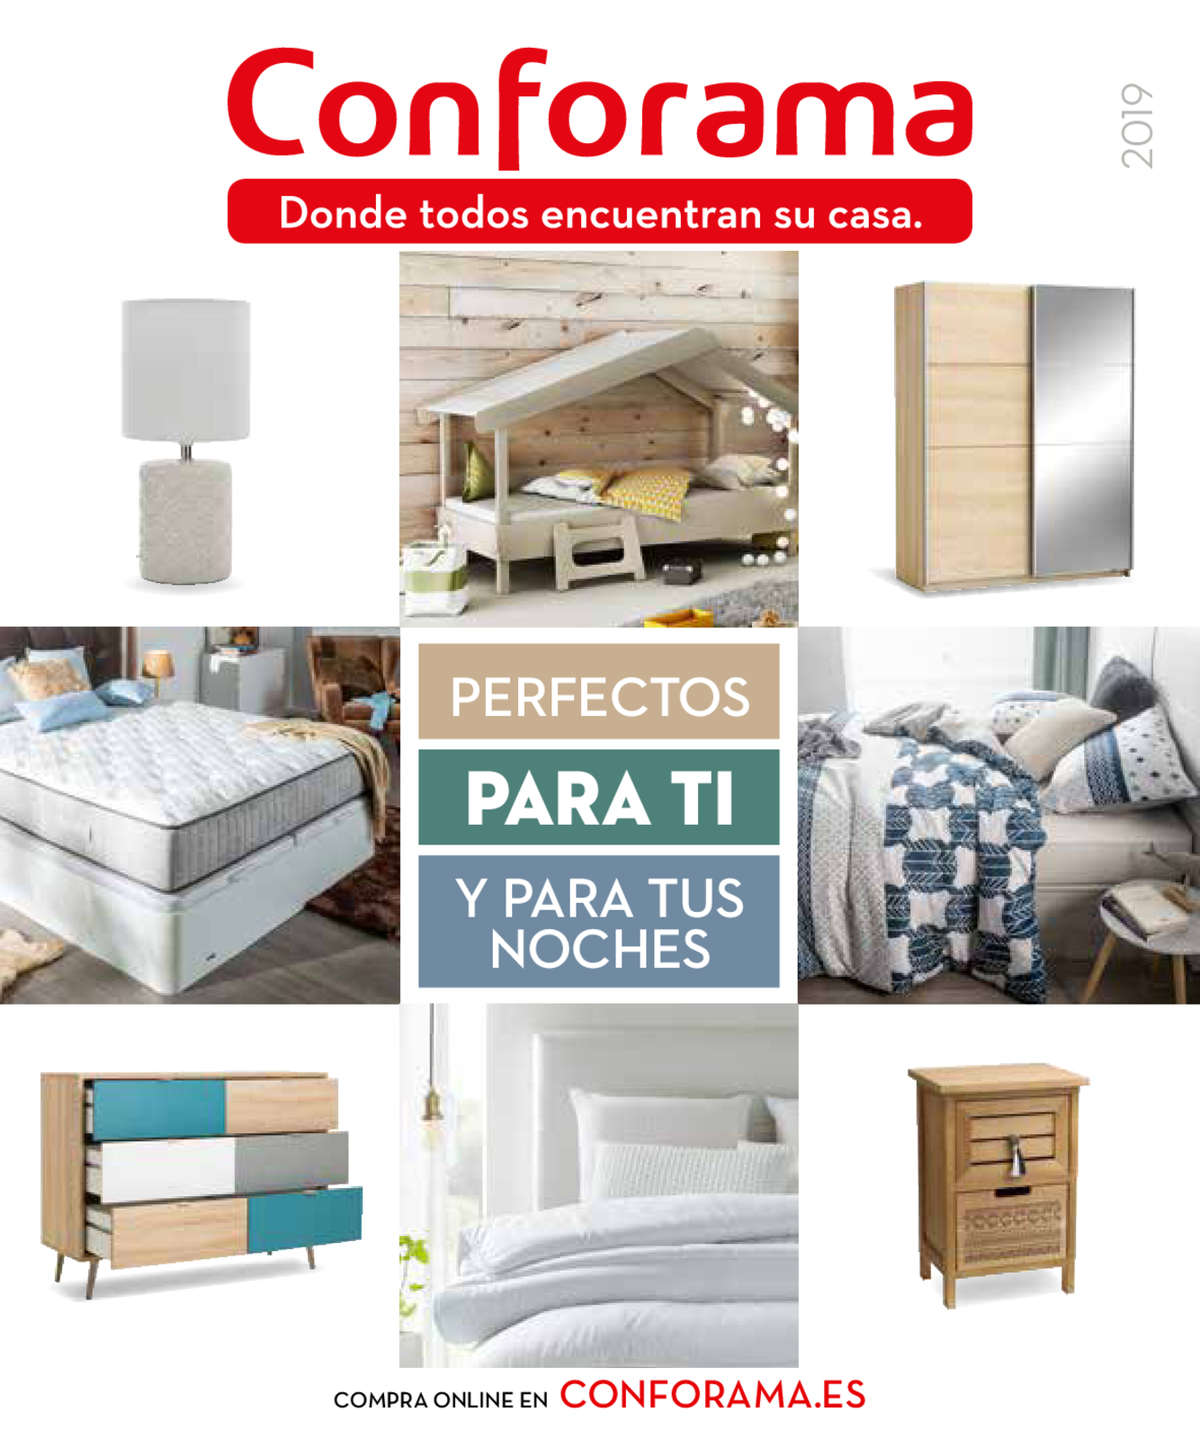 Conforama Salon Ofertas Y Catalogos Destacados Ofertia